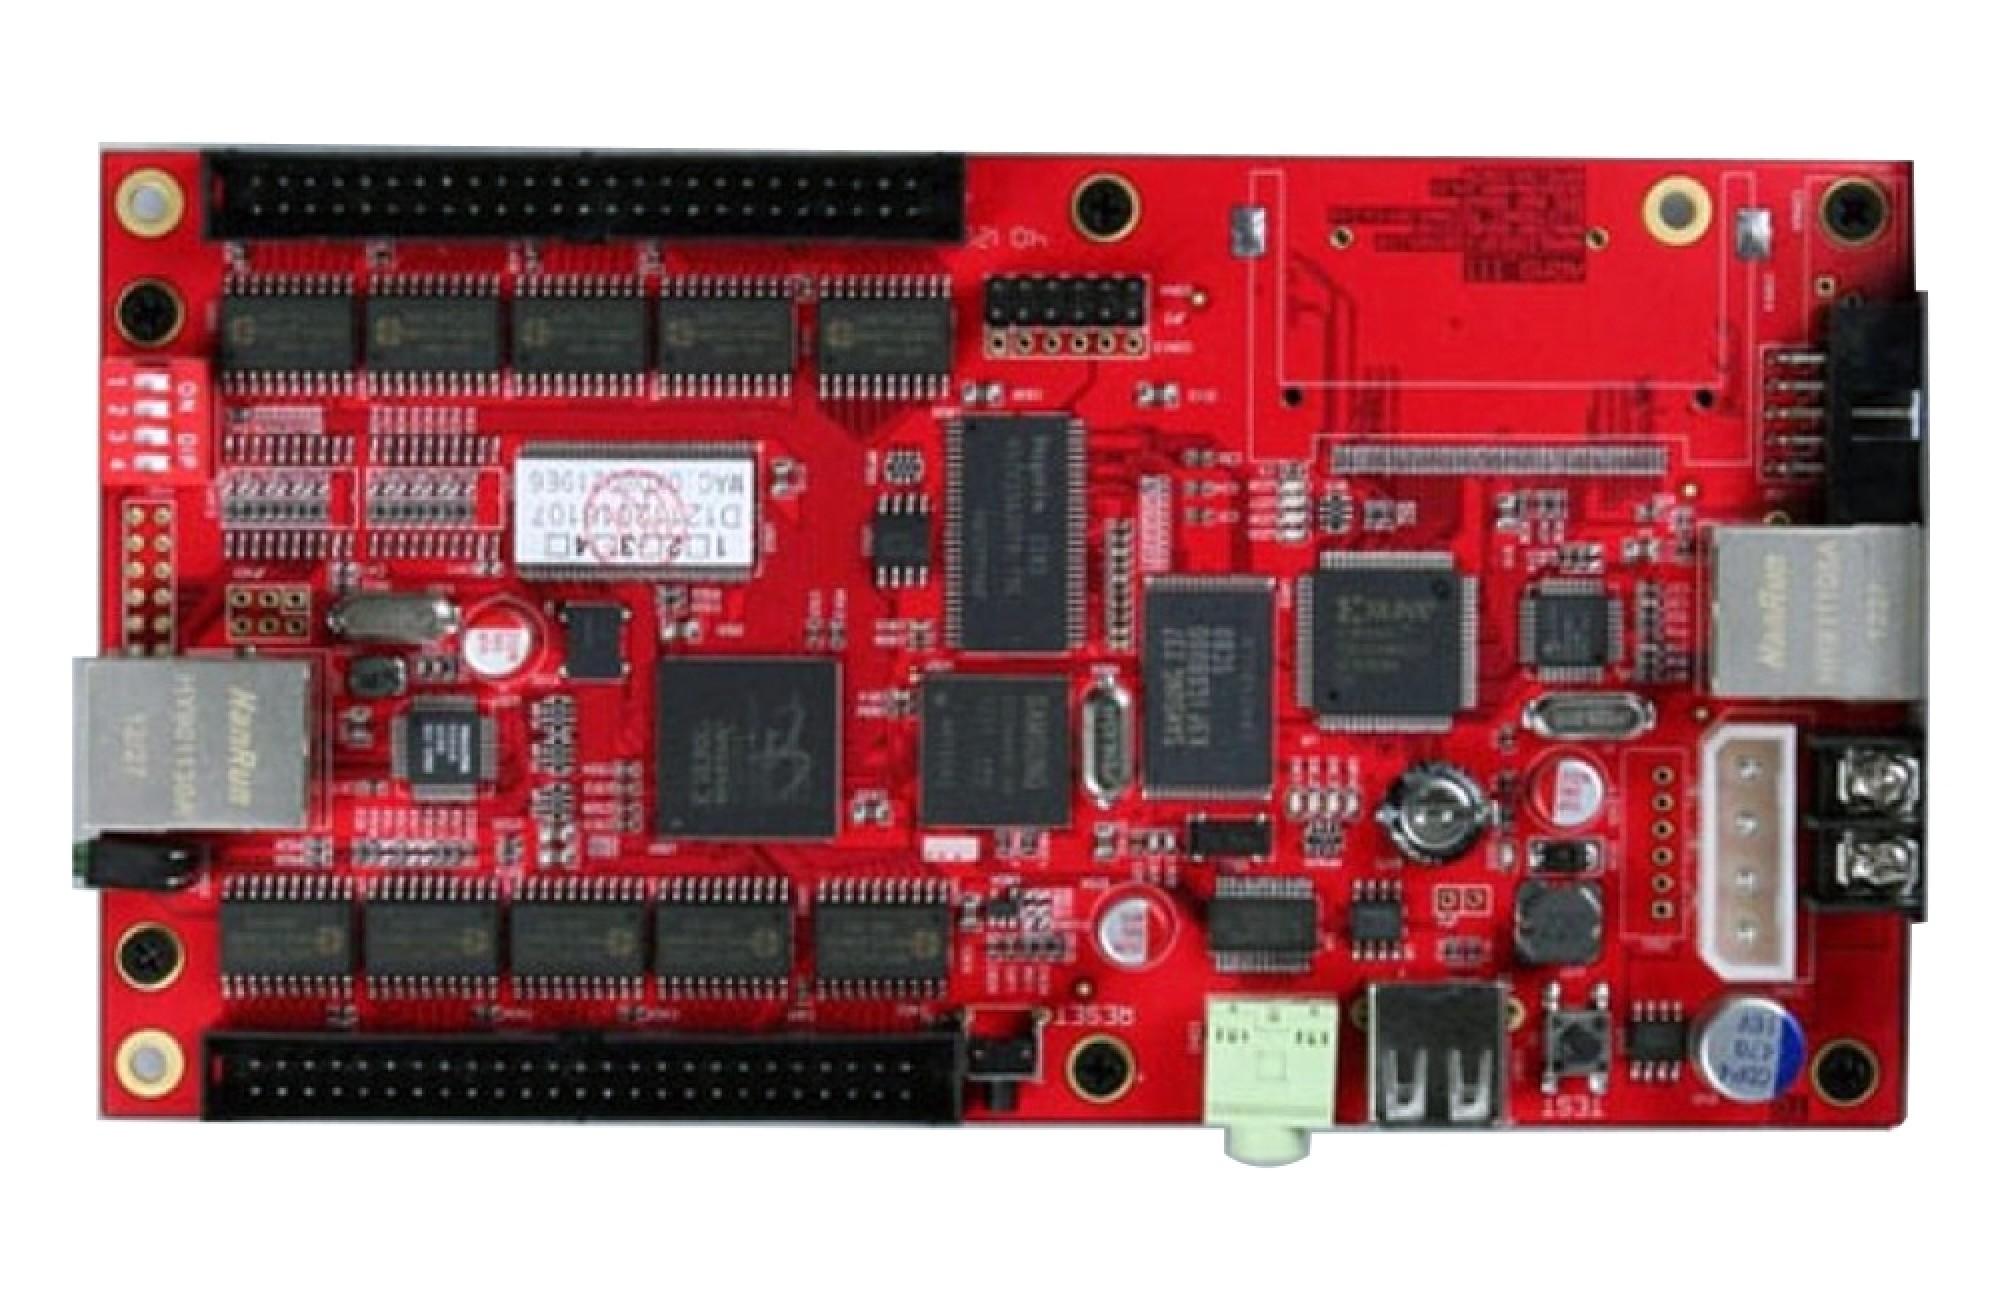 DBStar DBS-ASY09C Asynchronous LED Display Control Module